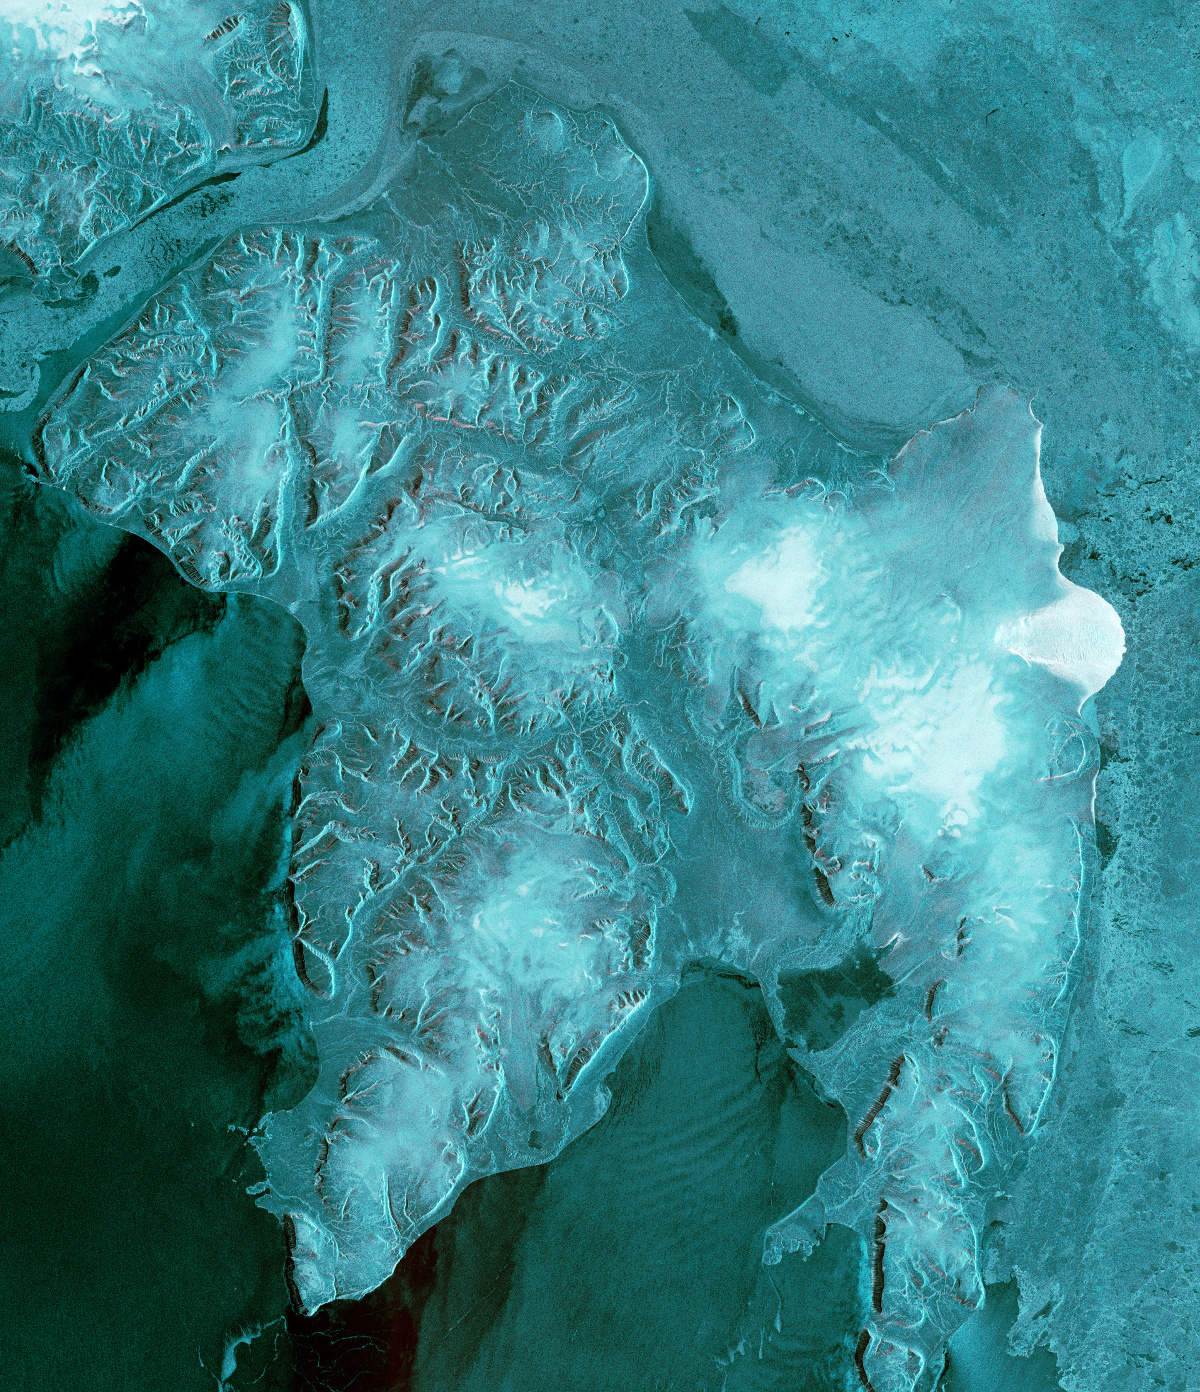 Sentinel-1B - Première image - First image - Edge island - Edgoya - ESA - Copernicus - SAR - Bande C